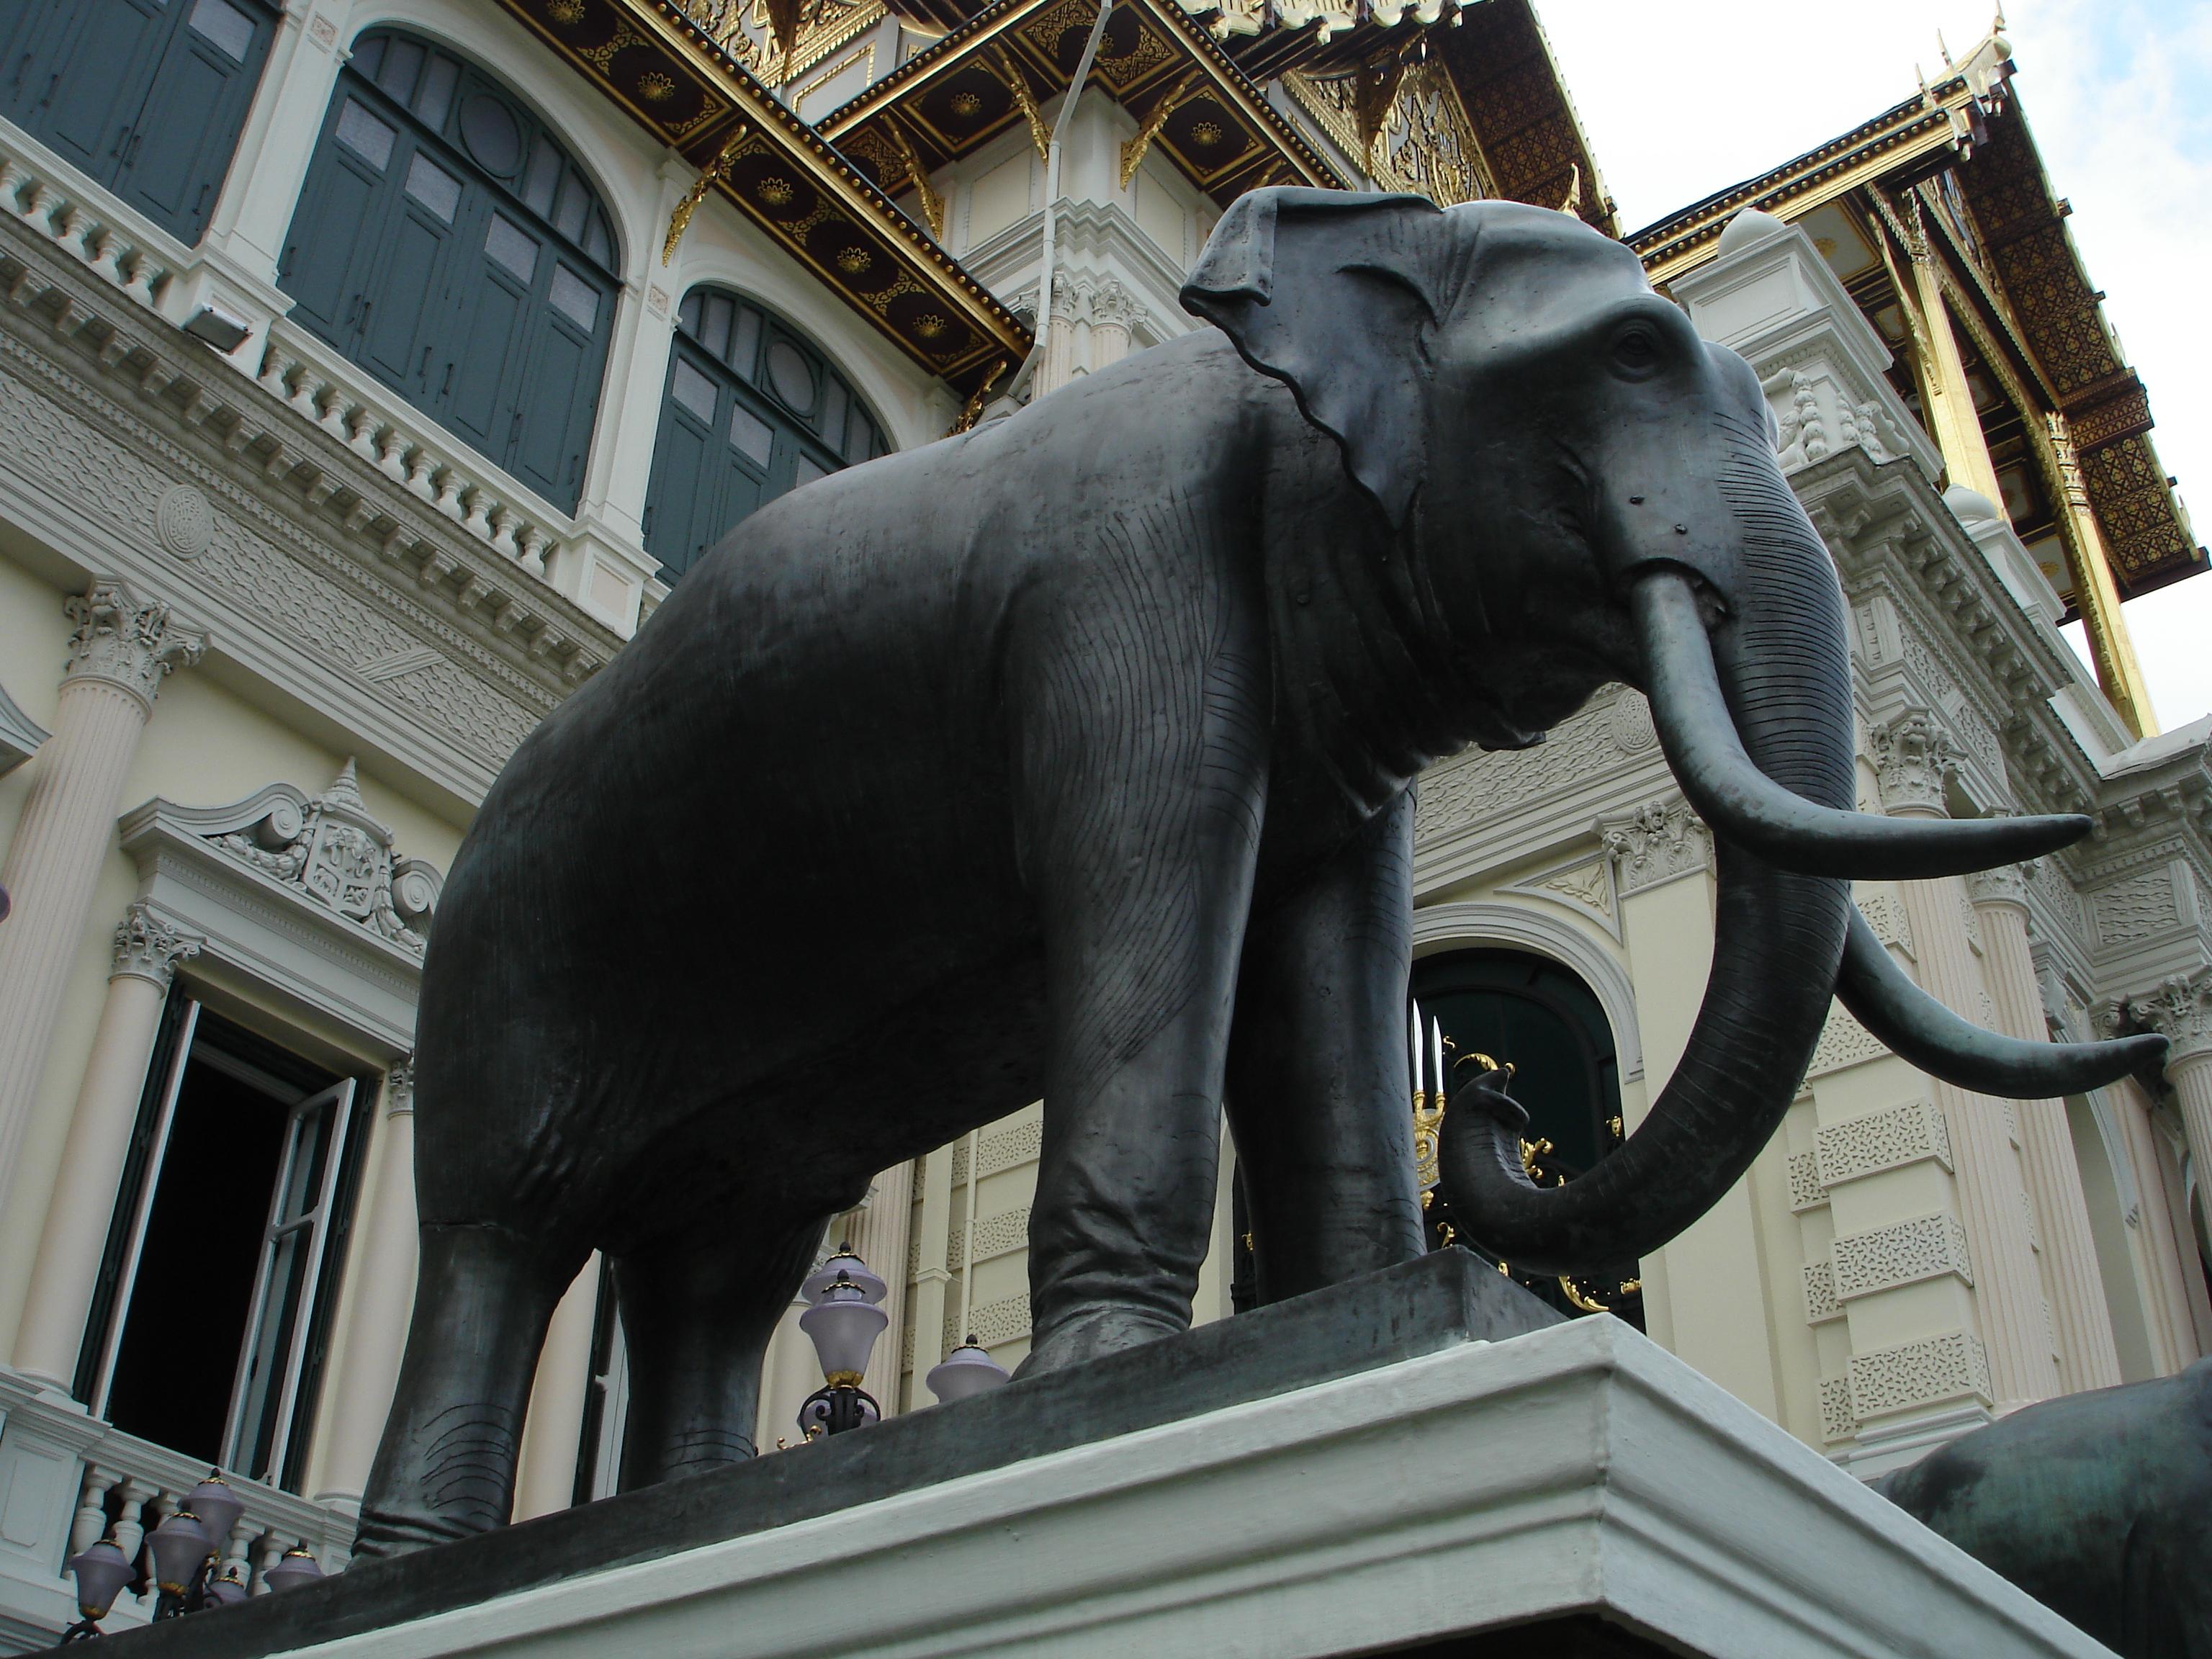 Grand Palace in Bangkok. Photo taken by Mark Jochim on May 17, 2006.